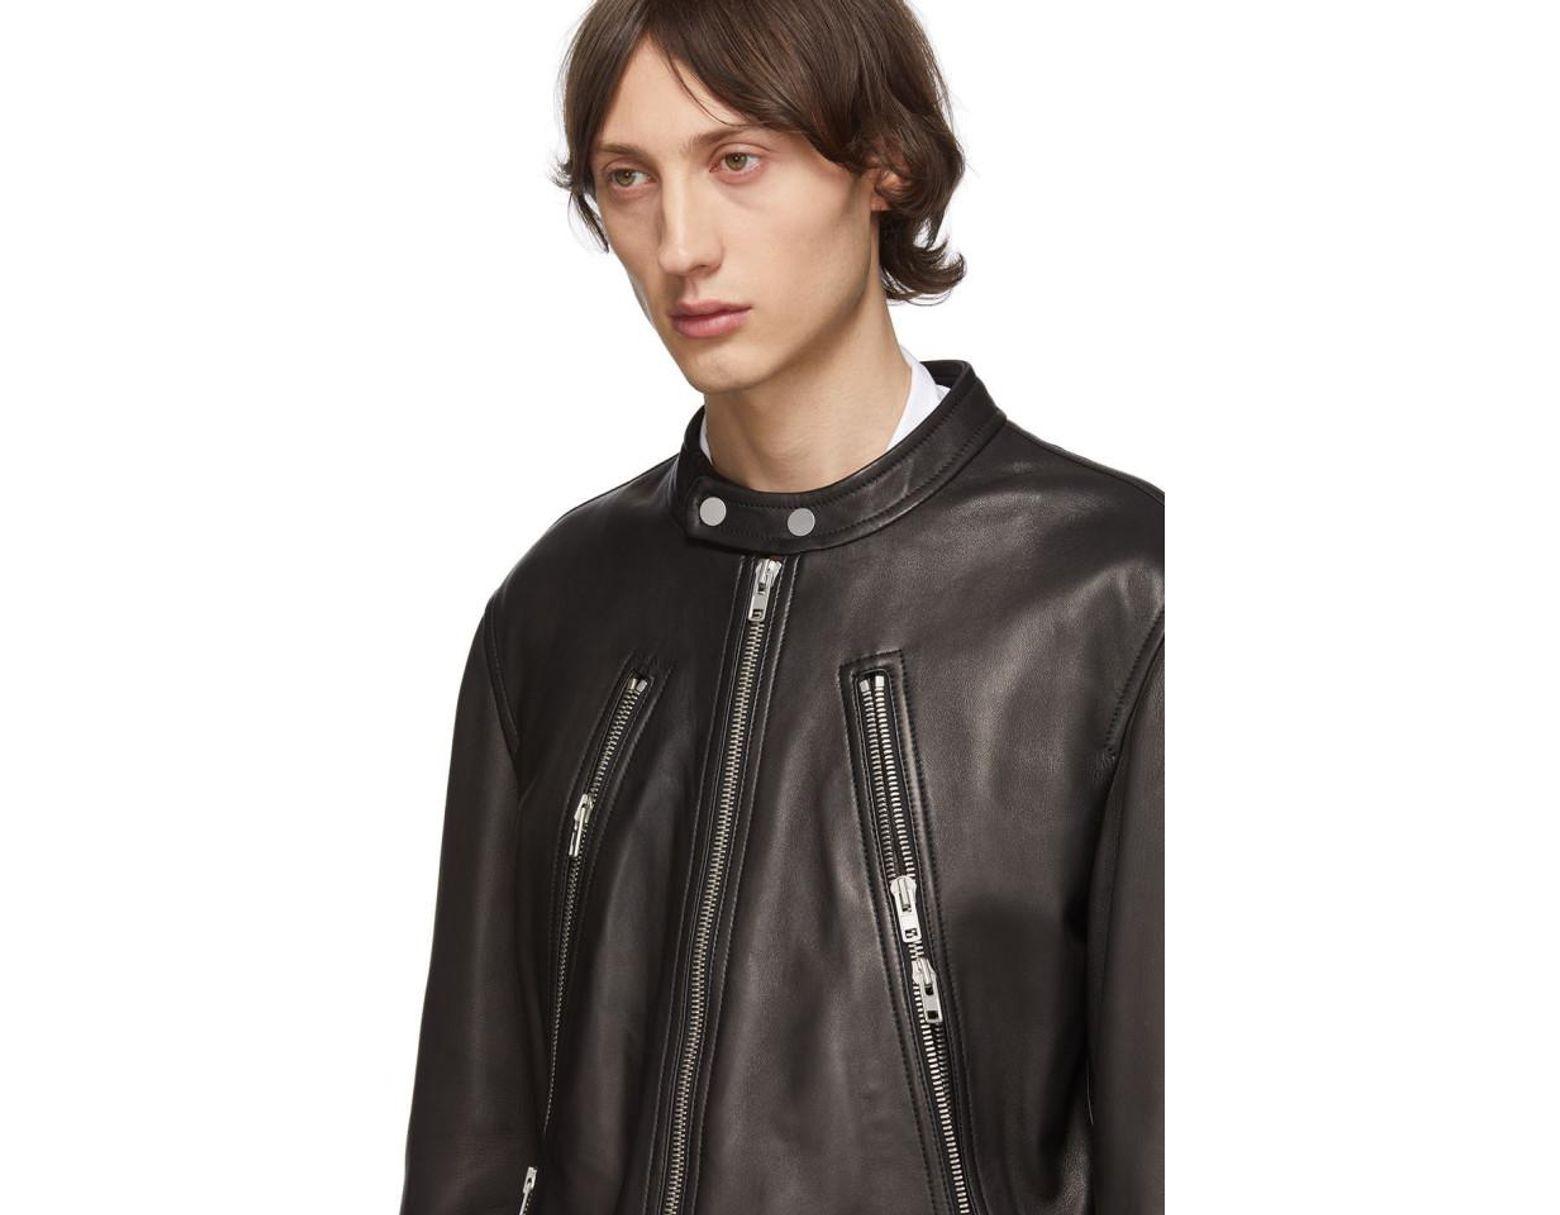 3f53d1eb8 Maison Margiela Black Leather 5-zip Sports Jacket in Black for Men ...